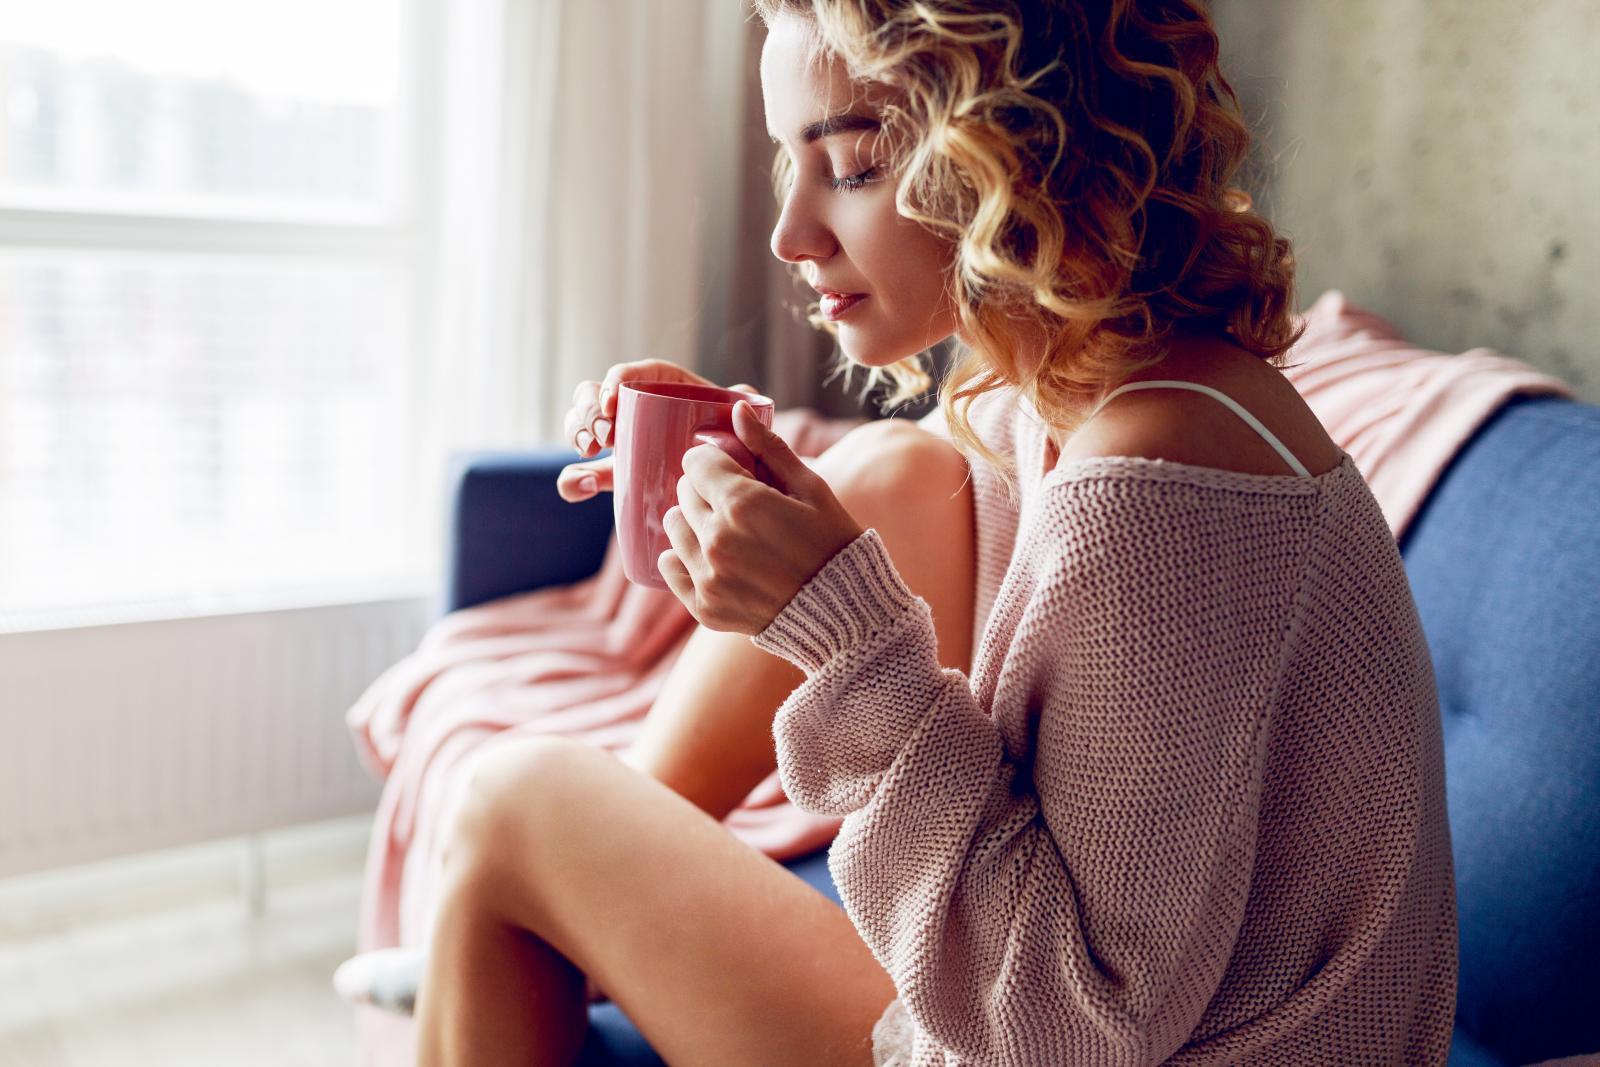 Čaj je uvijek dobra ideja, a onaj od đumbira donosi brojne zdravstvene prednosti.